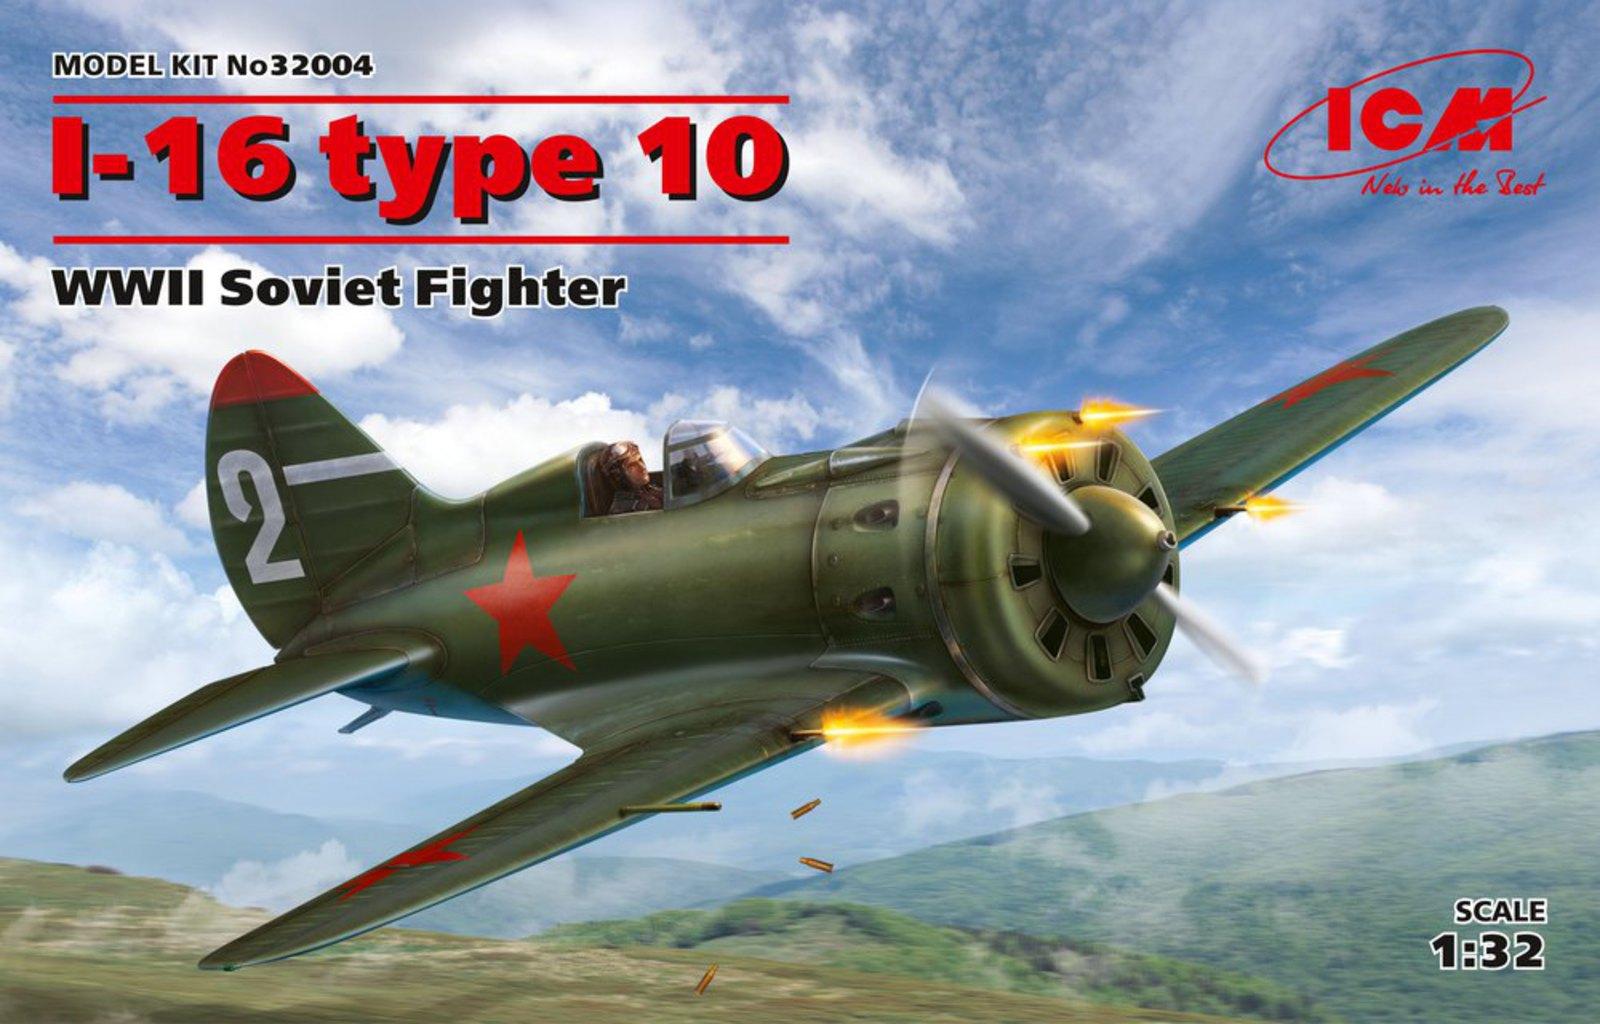 ICM I-16 type 10, WWII Soviet Fighter